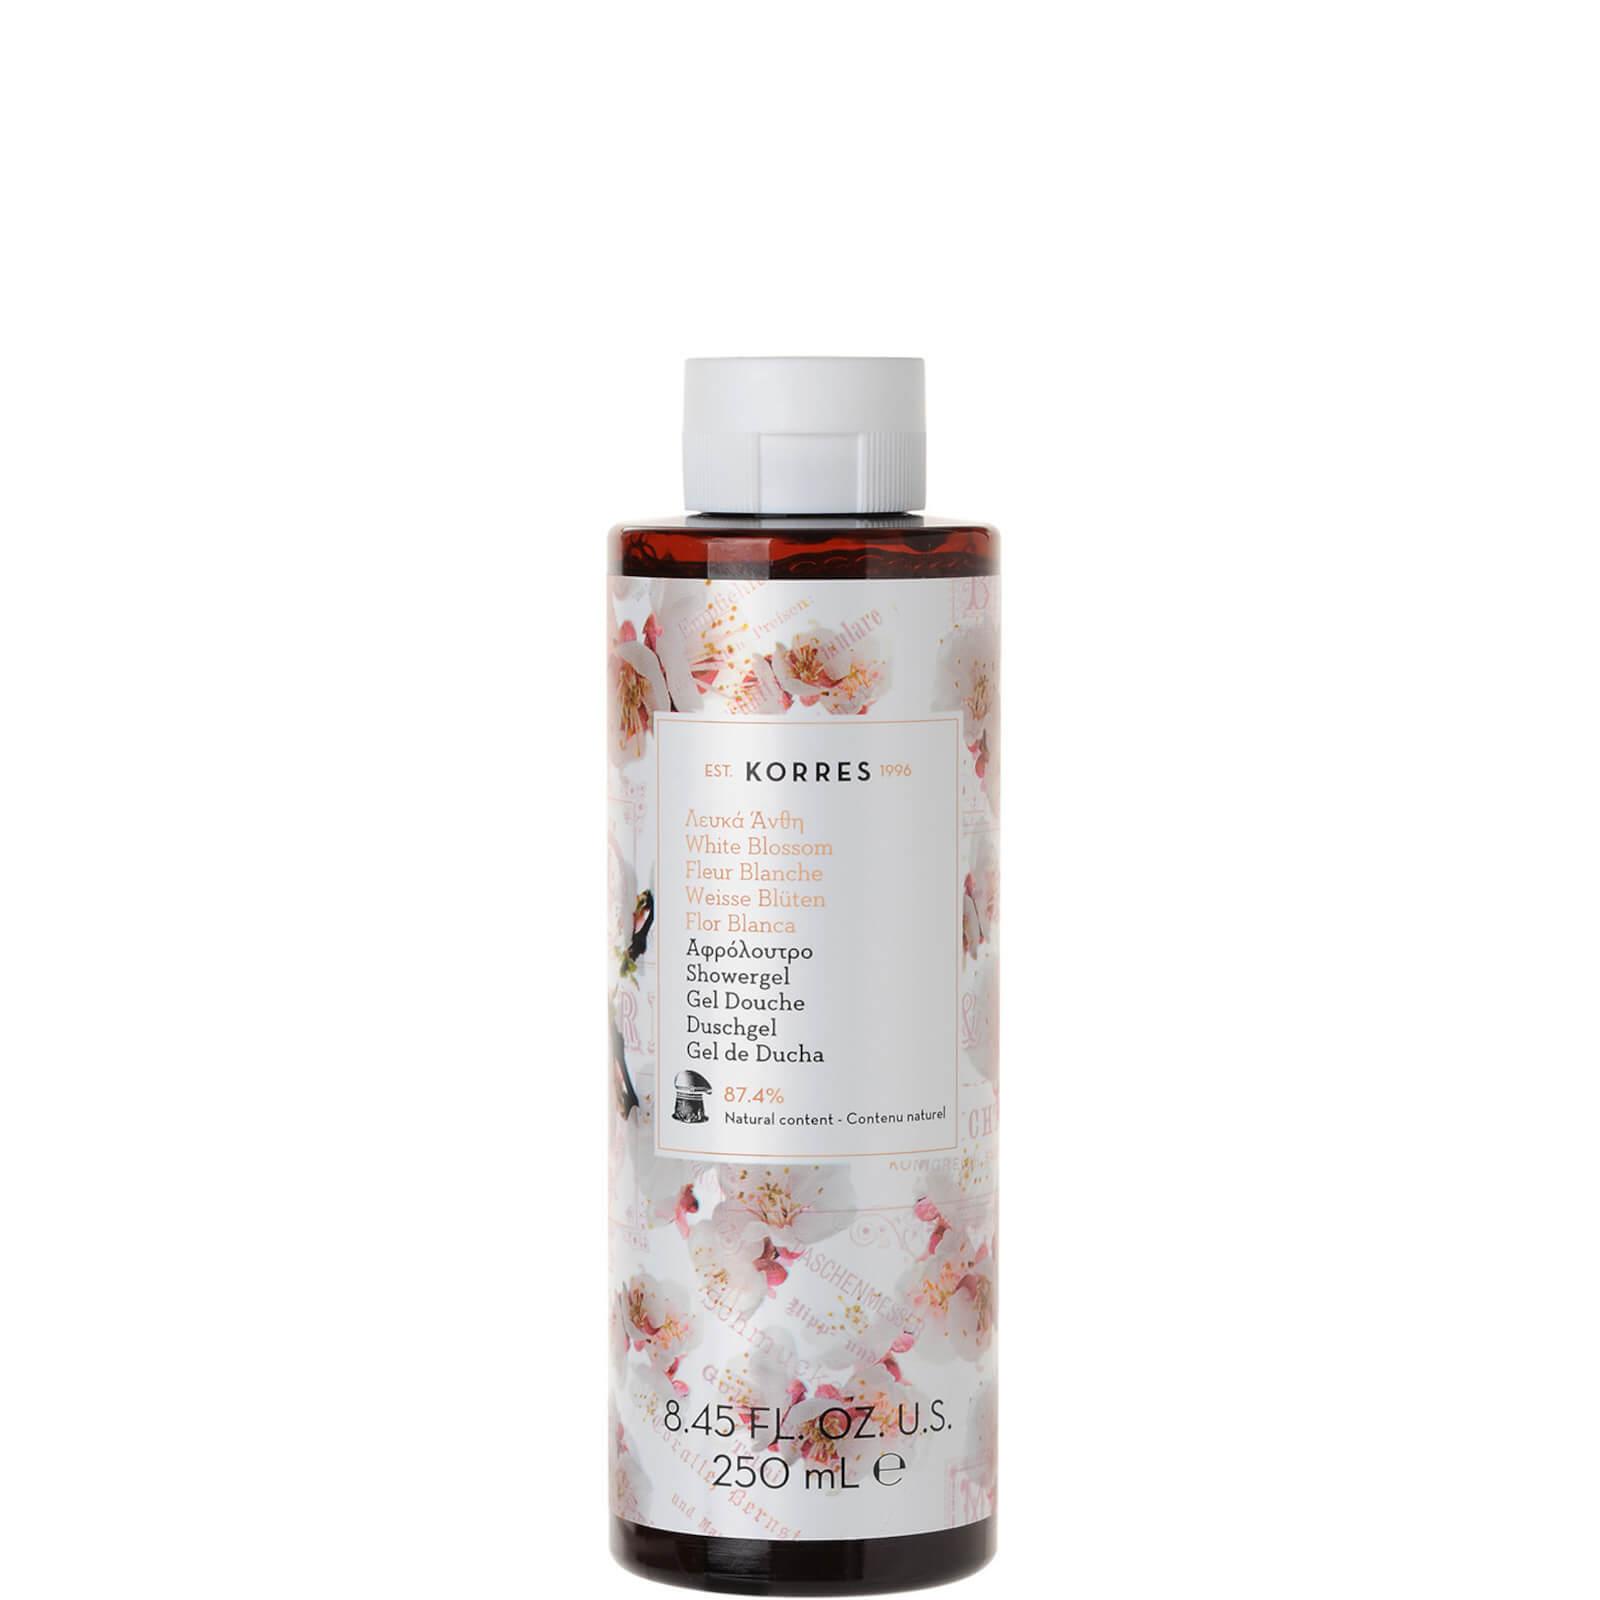 Купить KORRES White Blossom Renewing Body Cleanser 250ml